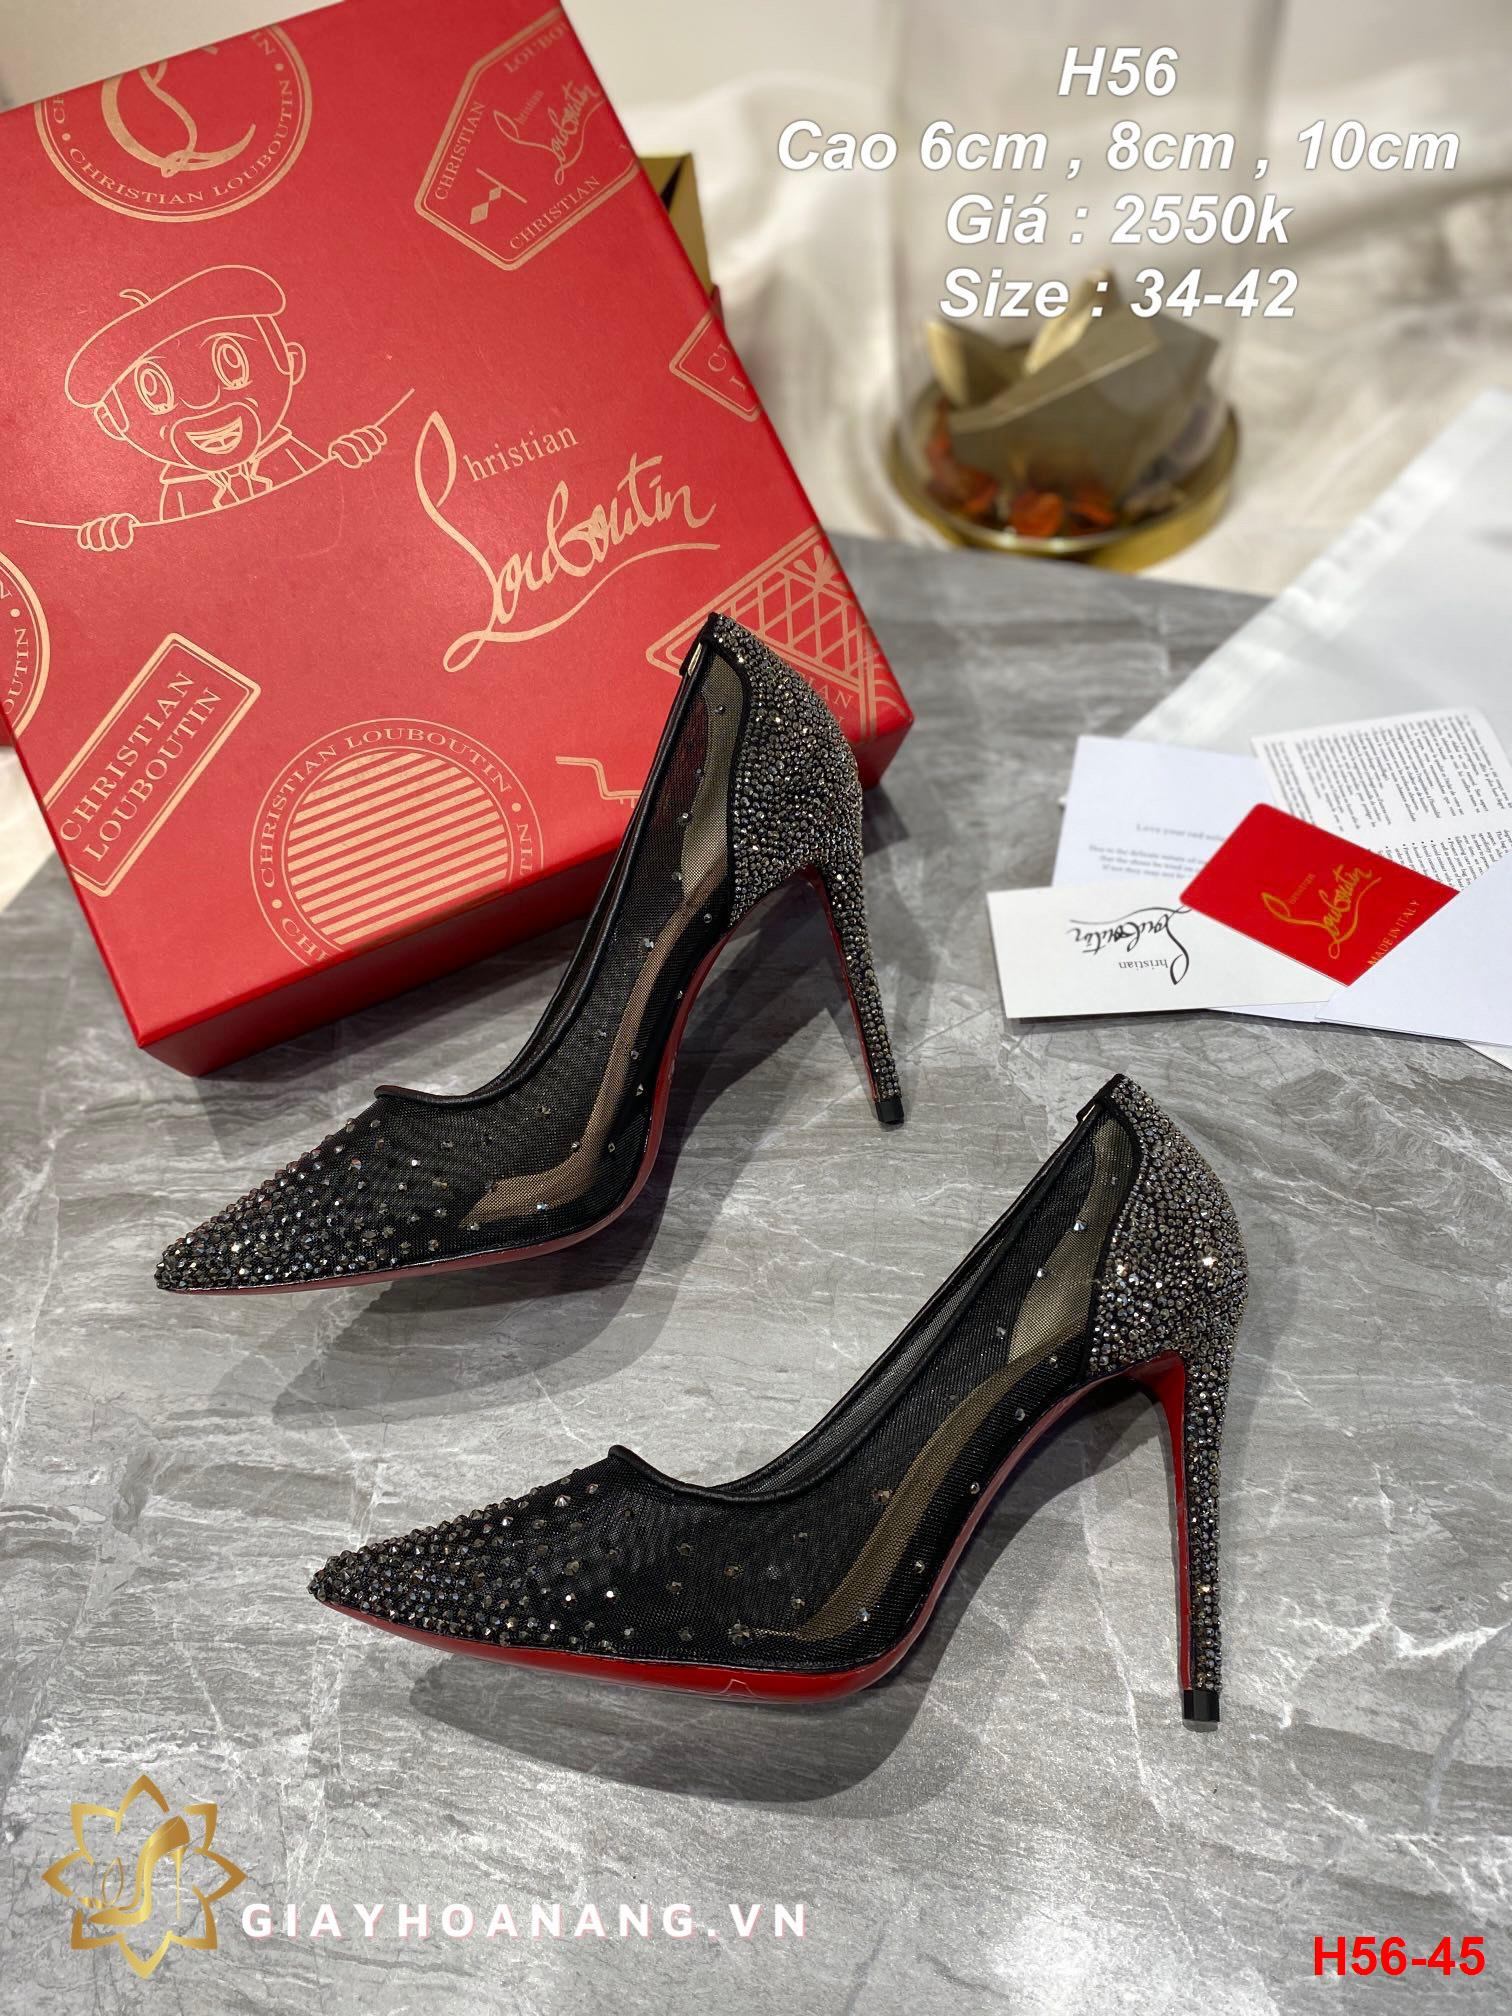 H56-45 Louboutin giày cao 6cm , 8cm , 10cm siêu cấp